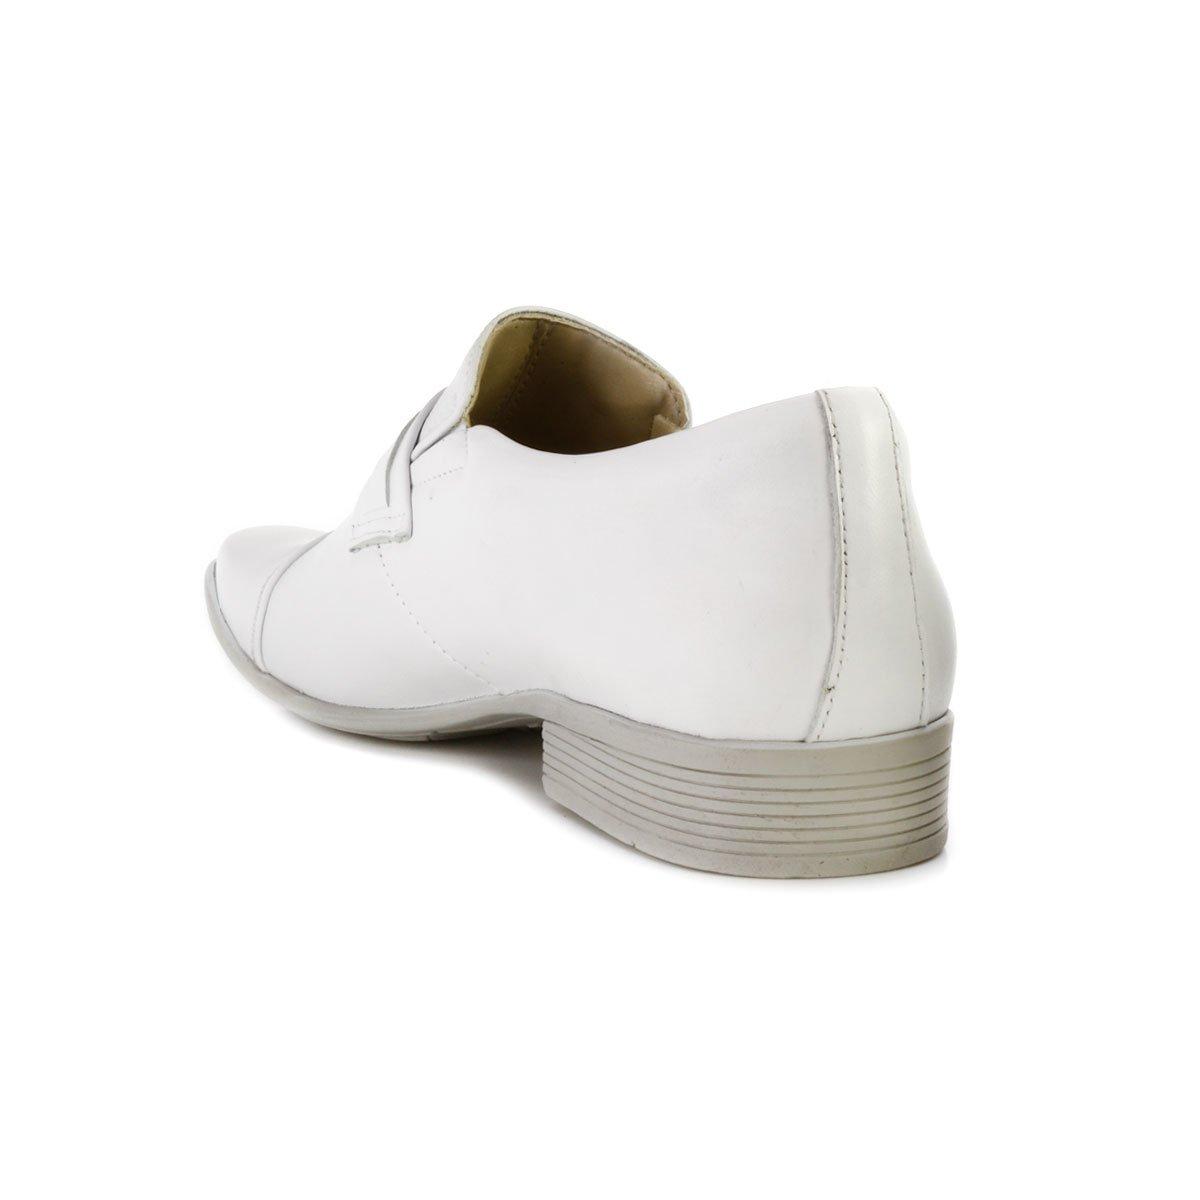 Jota Pe 13122 Sapato Pe Branco Branco Sapato 13122 Jota Jota Sapato Pe HxzgtBqw